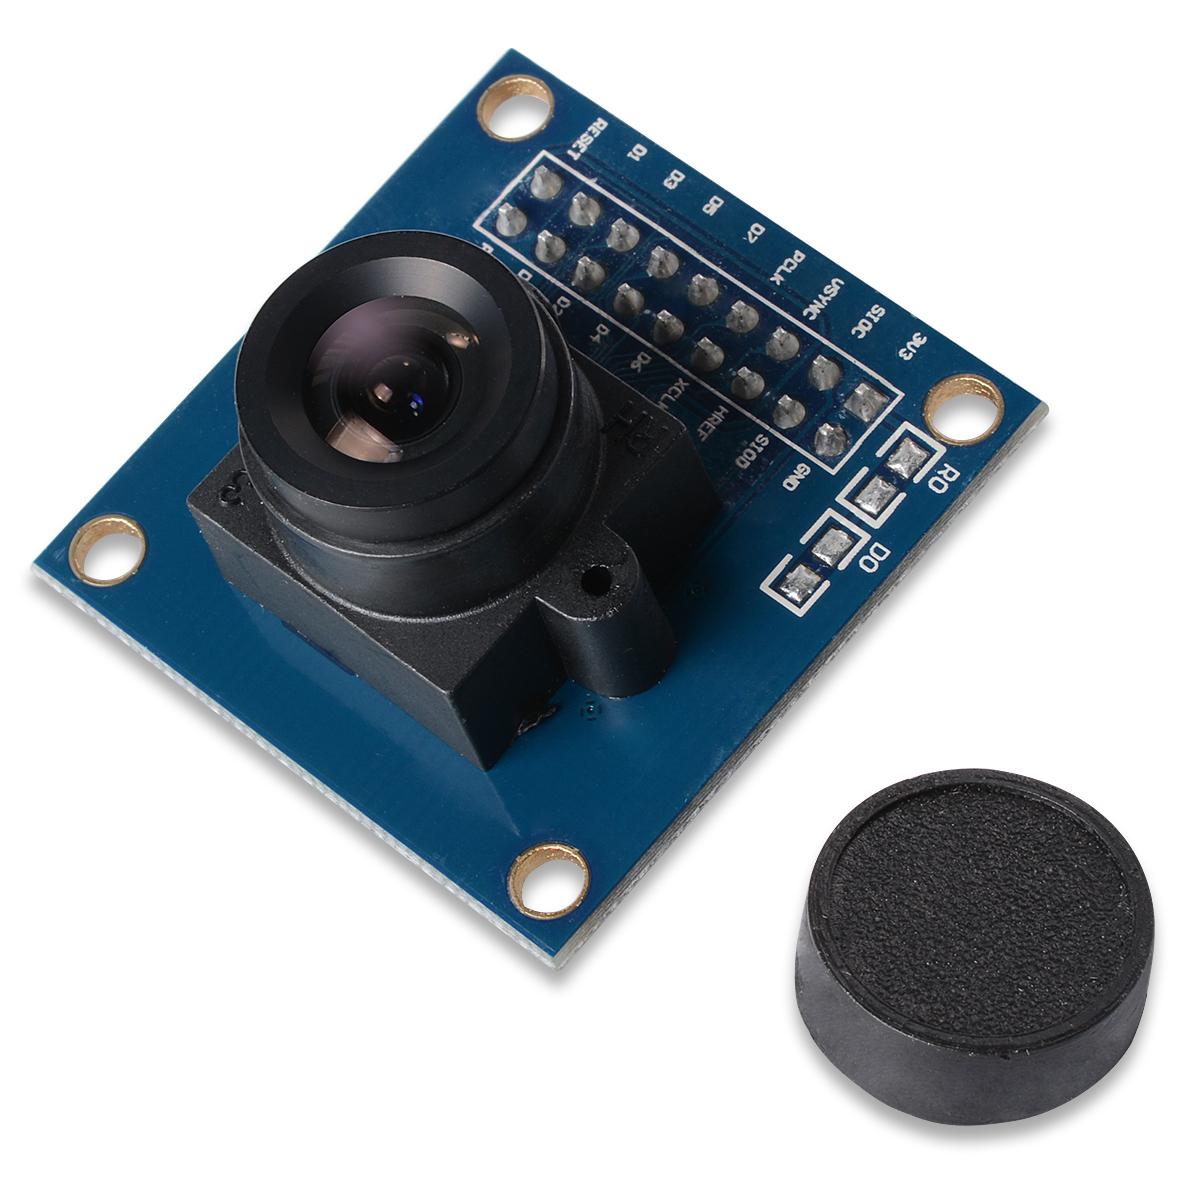 OV7670 640x480 300KP 0.3Mega VGA CMOS Camera Module I2C for Arduino FPGA TE150+(China (Mainland))